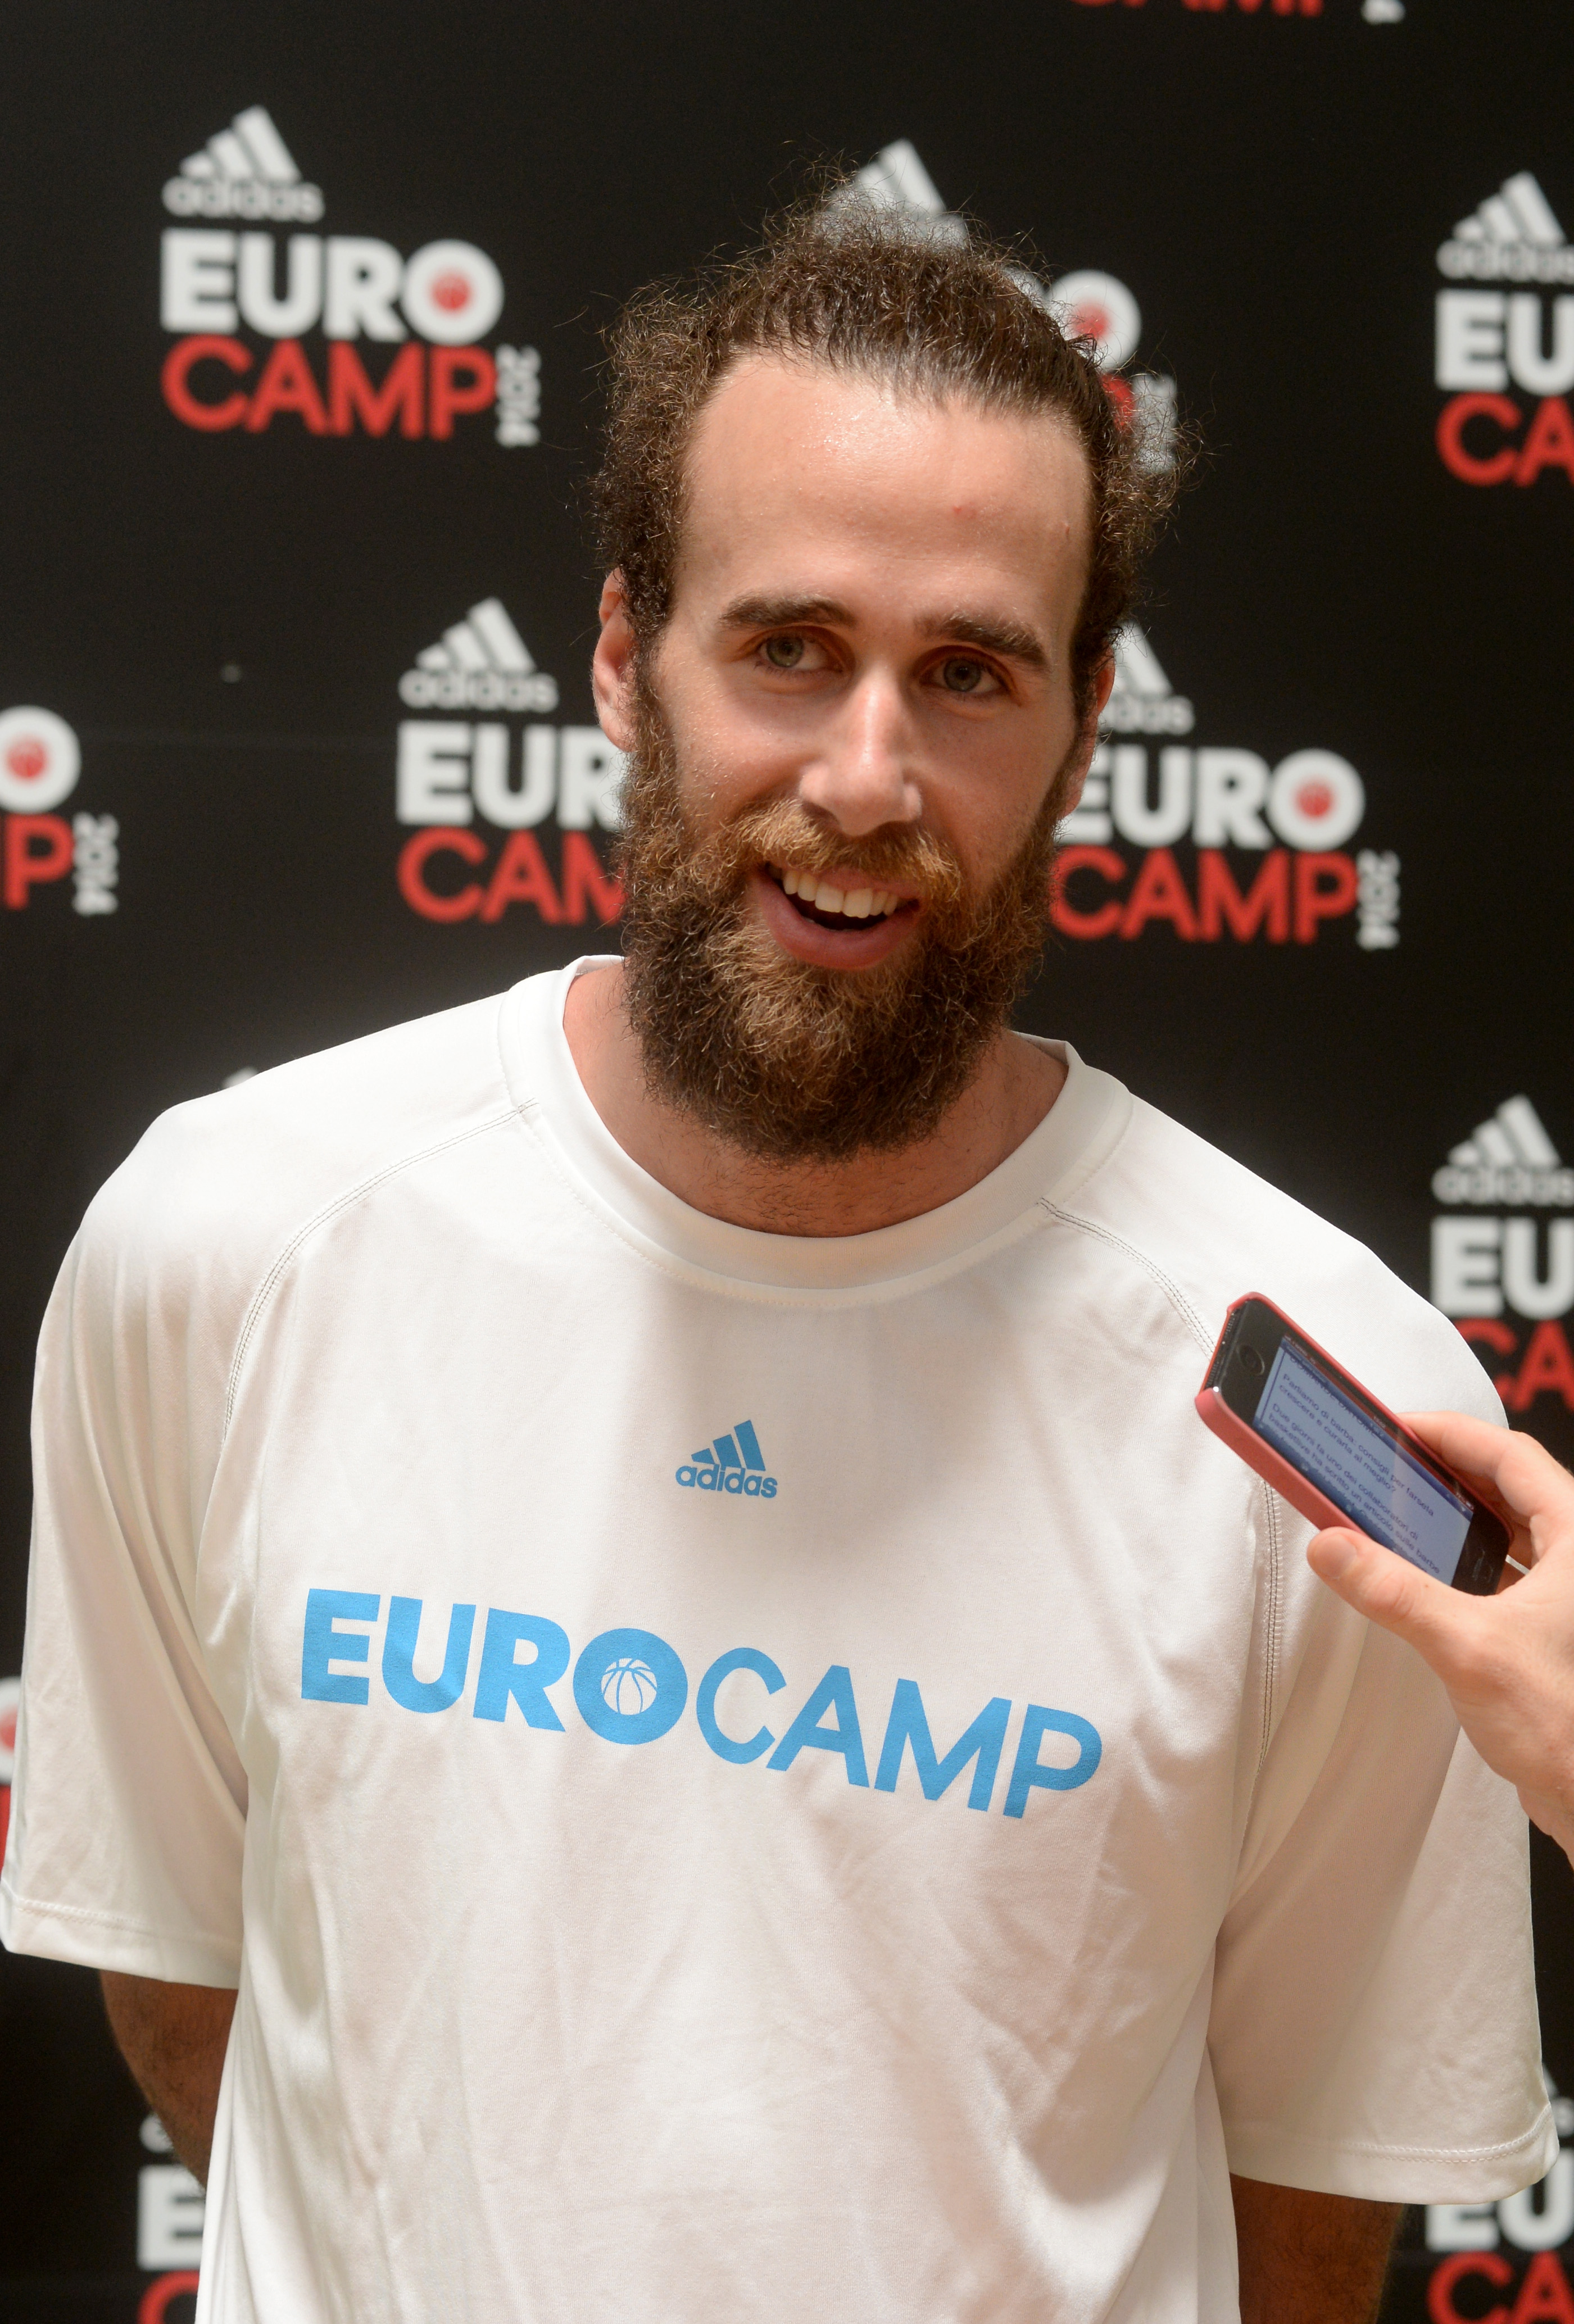 Adidas Eurocamp - Day 3